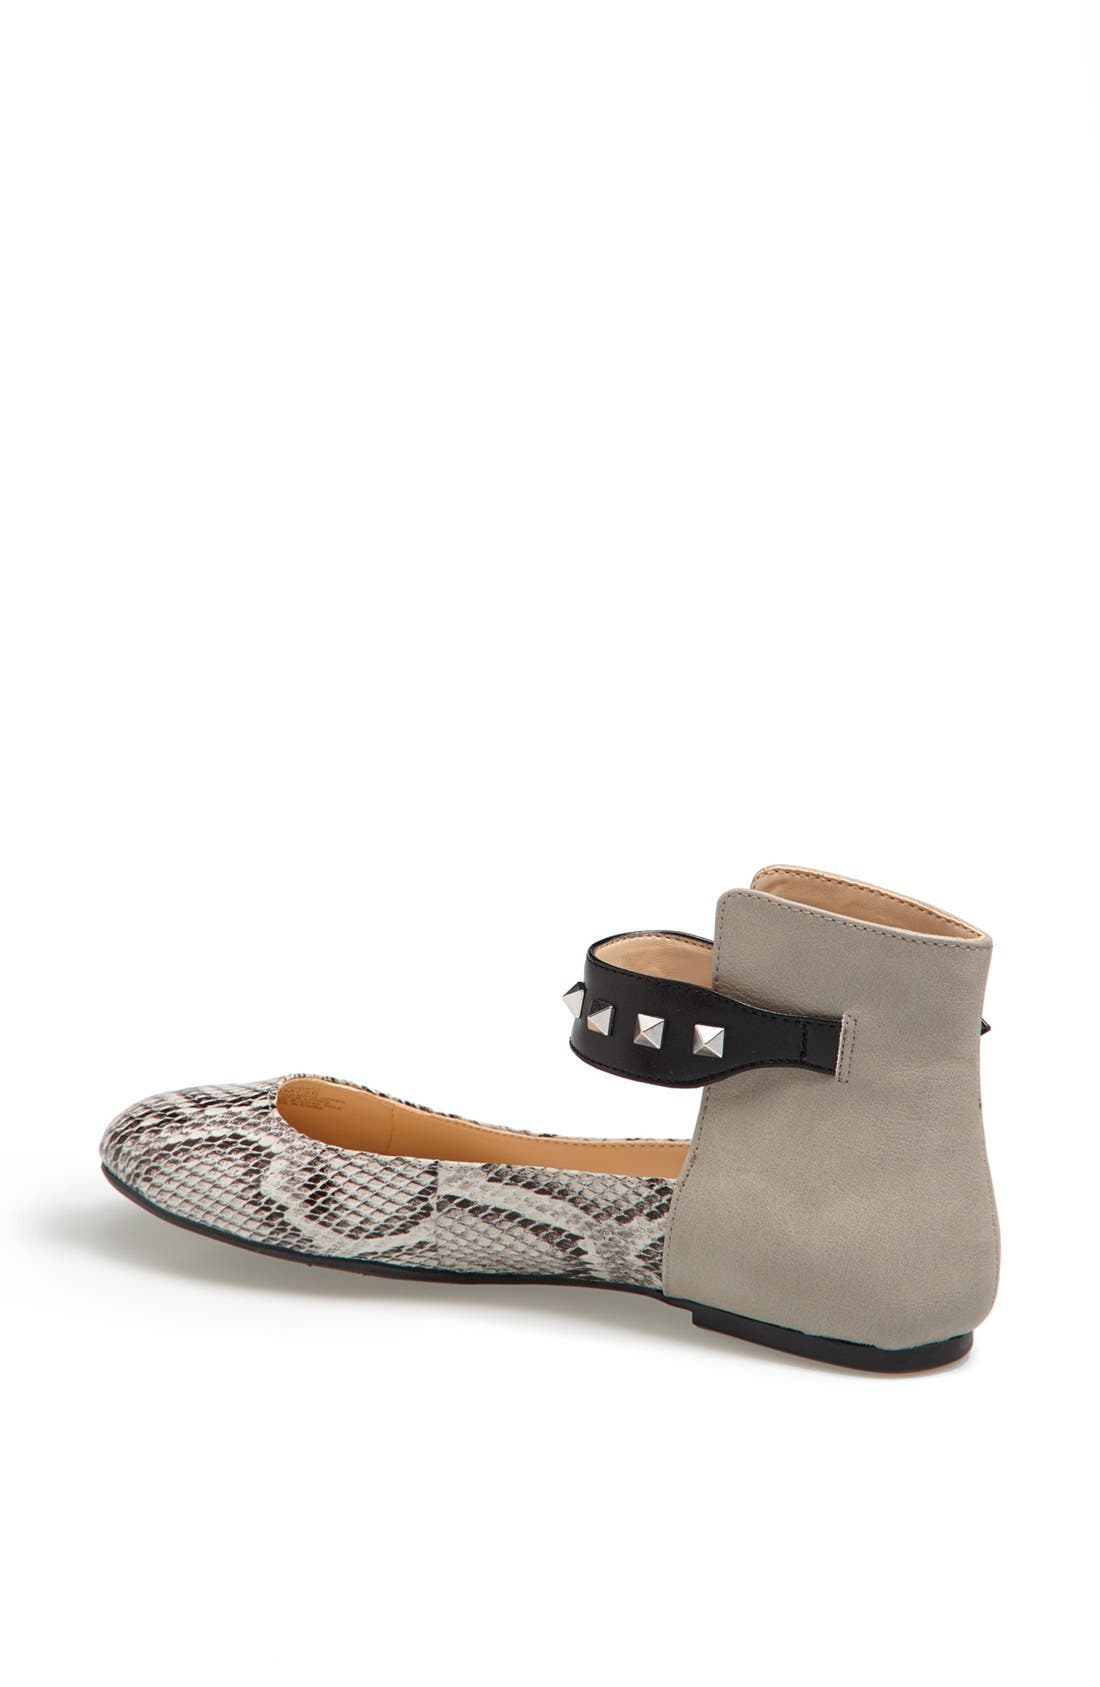 Alternate Image 2  - Jessica Simpson 'Munney' Studded Ankle Strap Flat